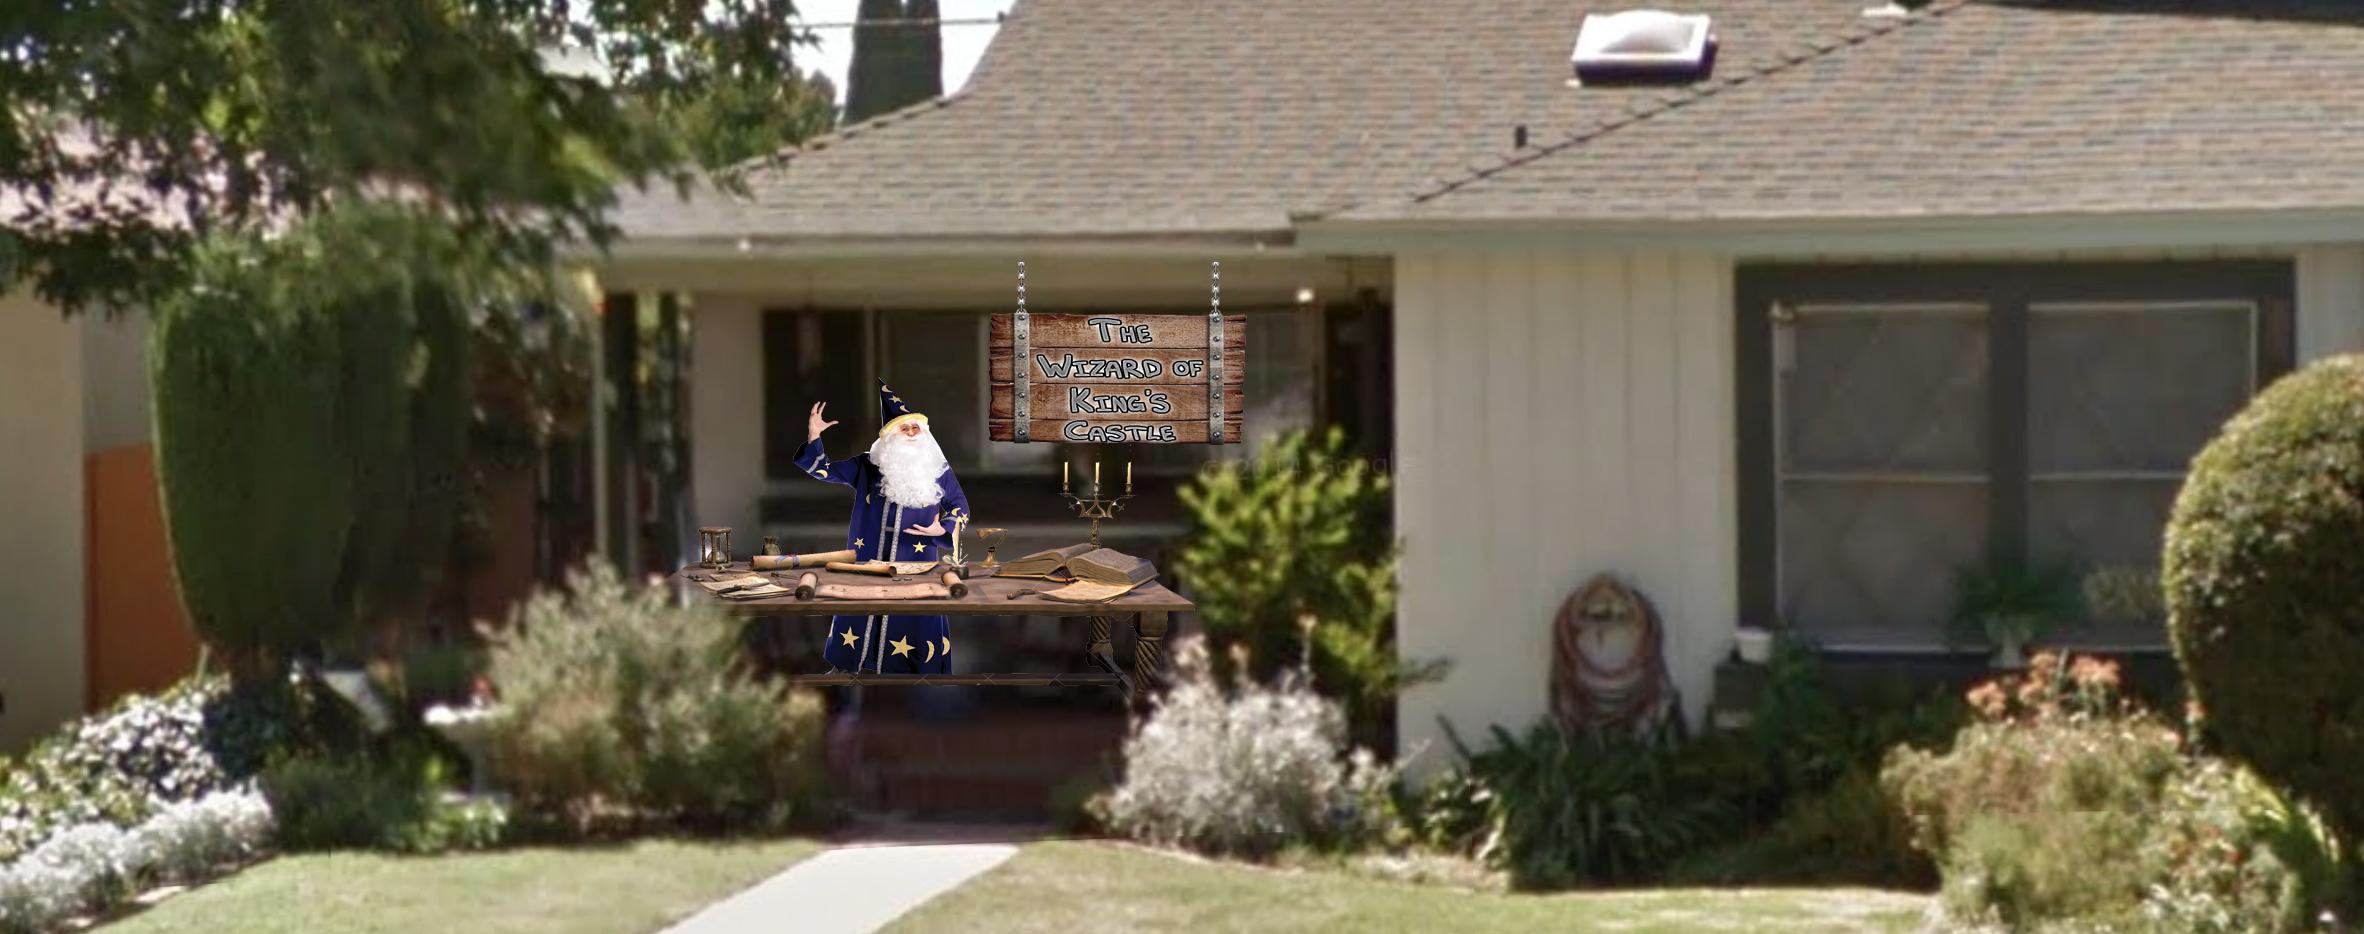 the Wizard porch location.jpg